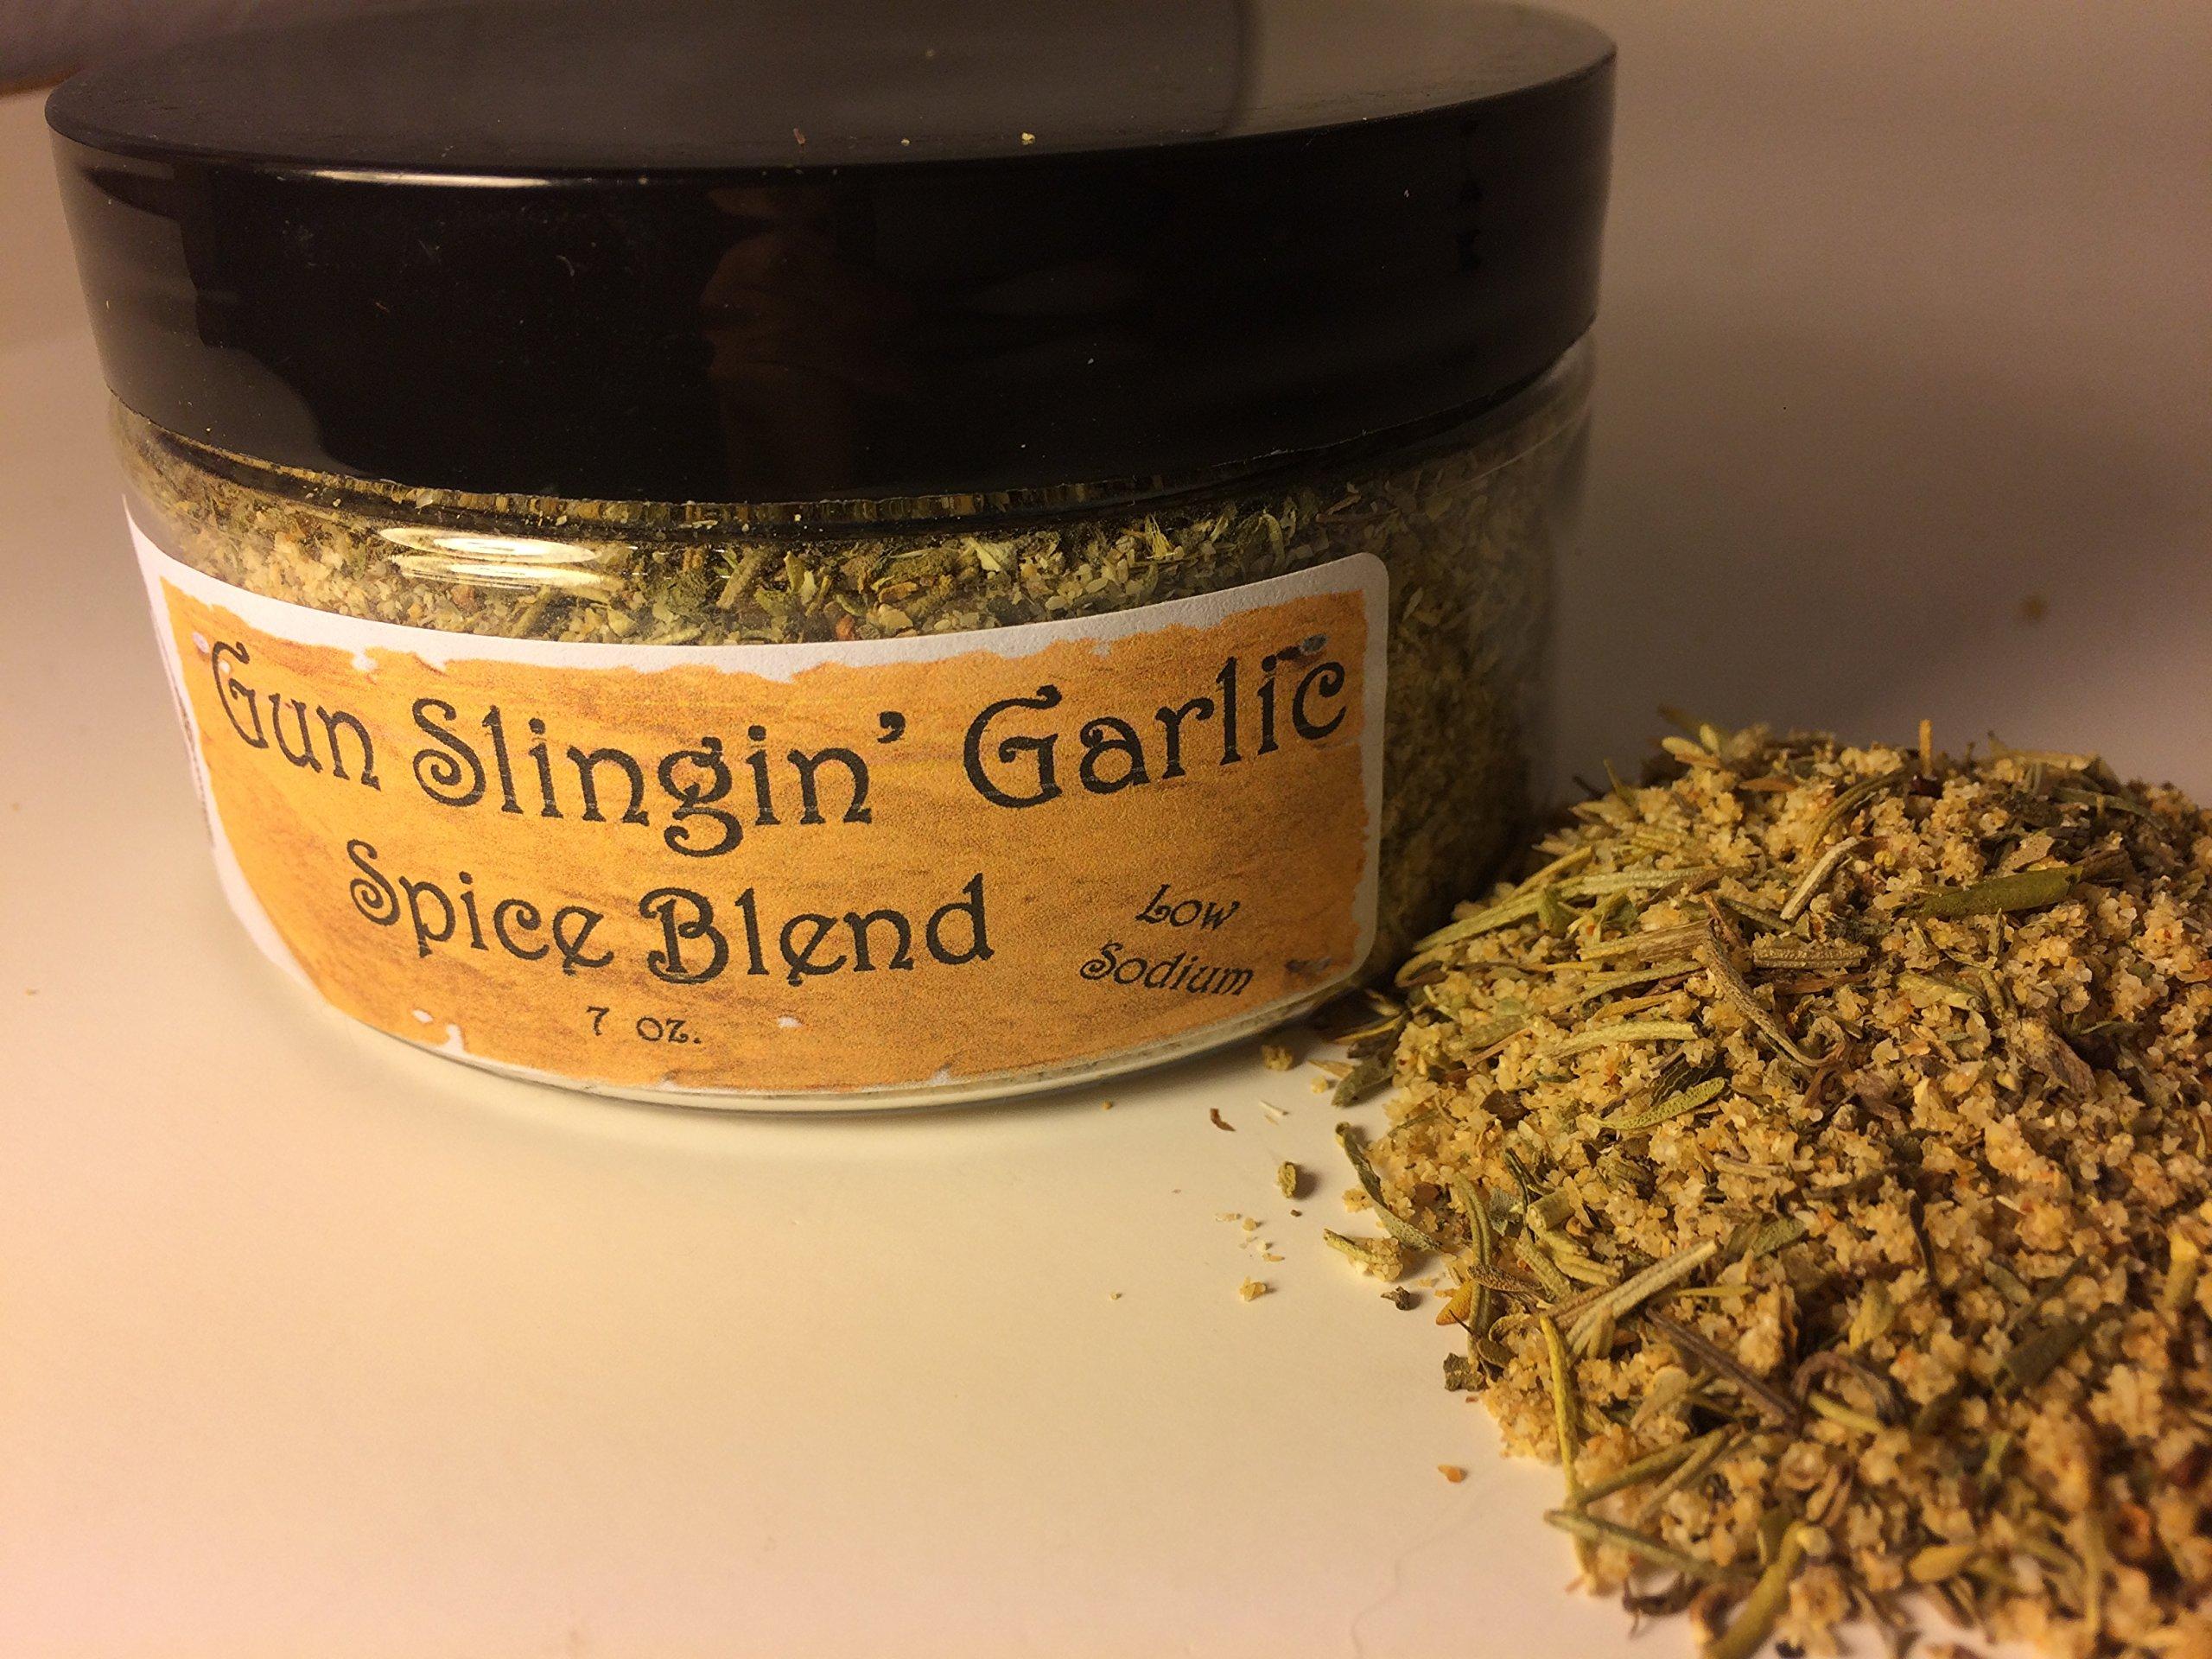 Gun Slingin' Garlic Low Sodium Spice Blend